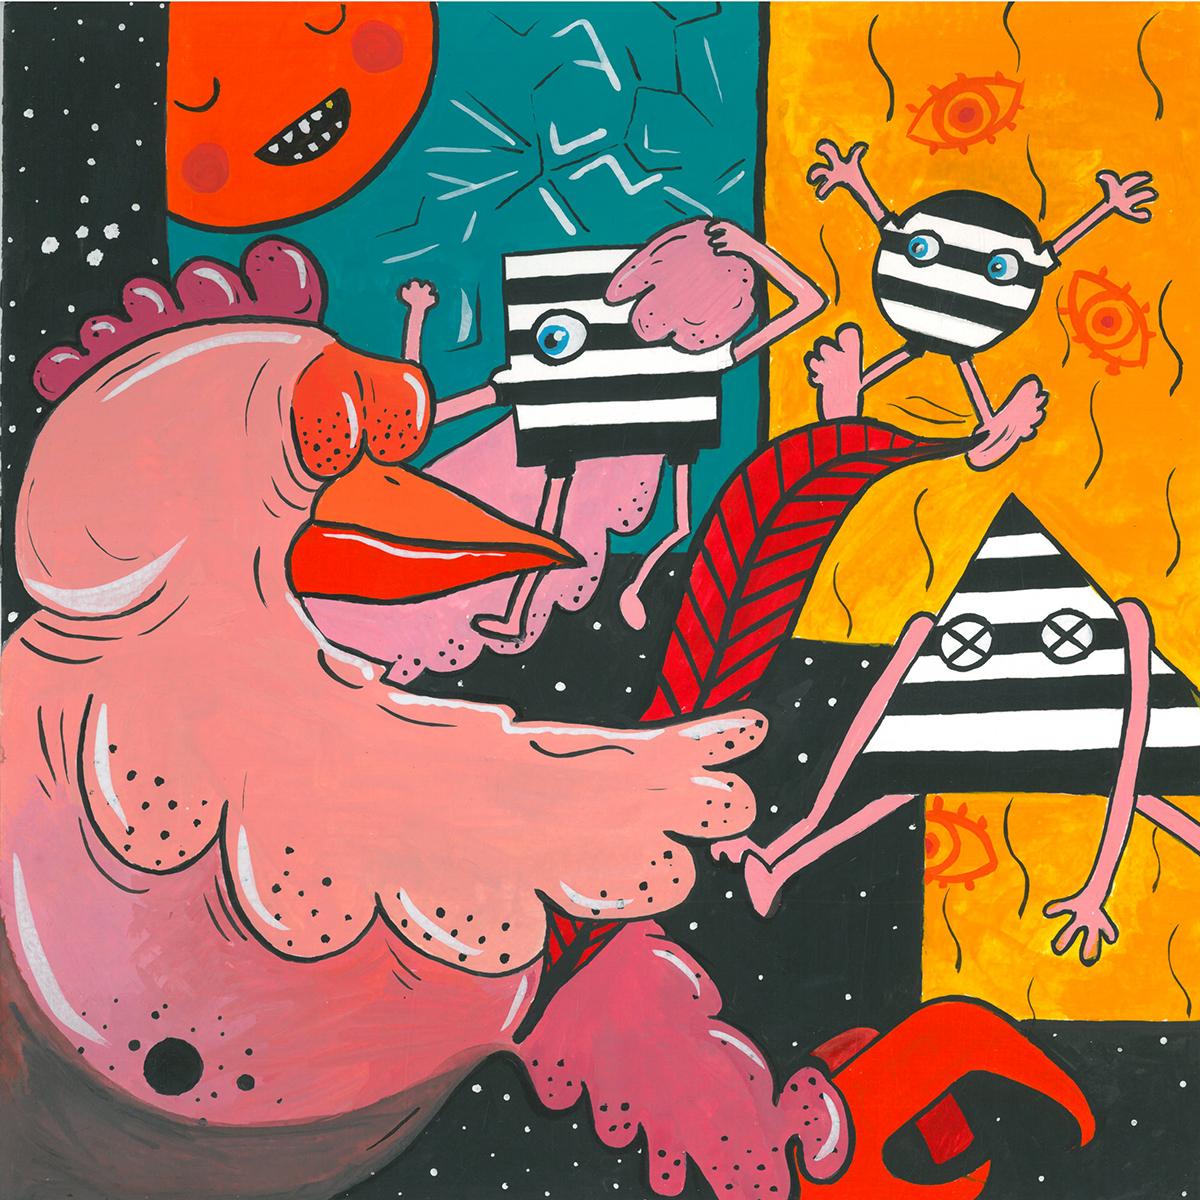 chicken psycho bates AlphabetBates personalitydisorder crazy night dream pinkfloyd Dissociative Drugs HfKBremen english NormanBates